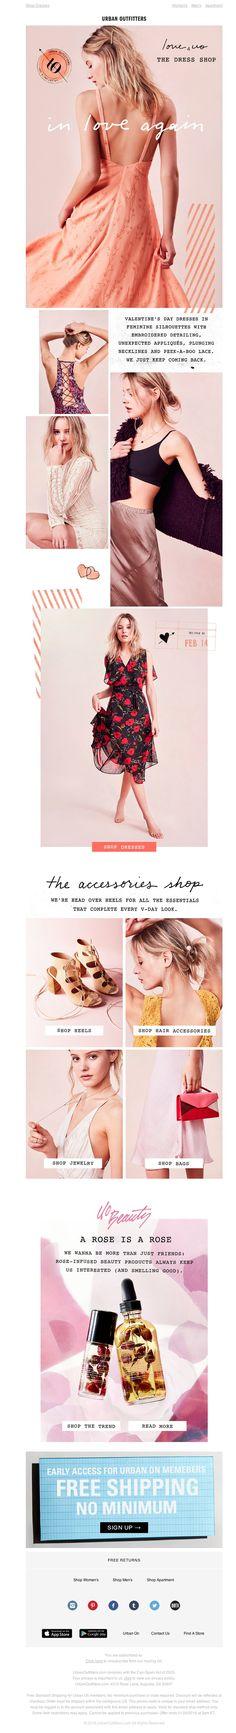 Urban Outfitters - Falling hard for feminine dresses →